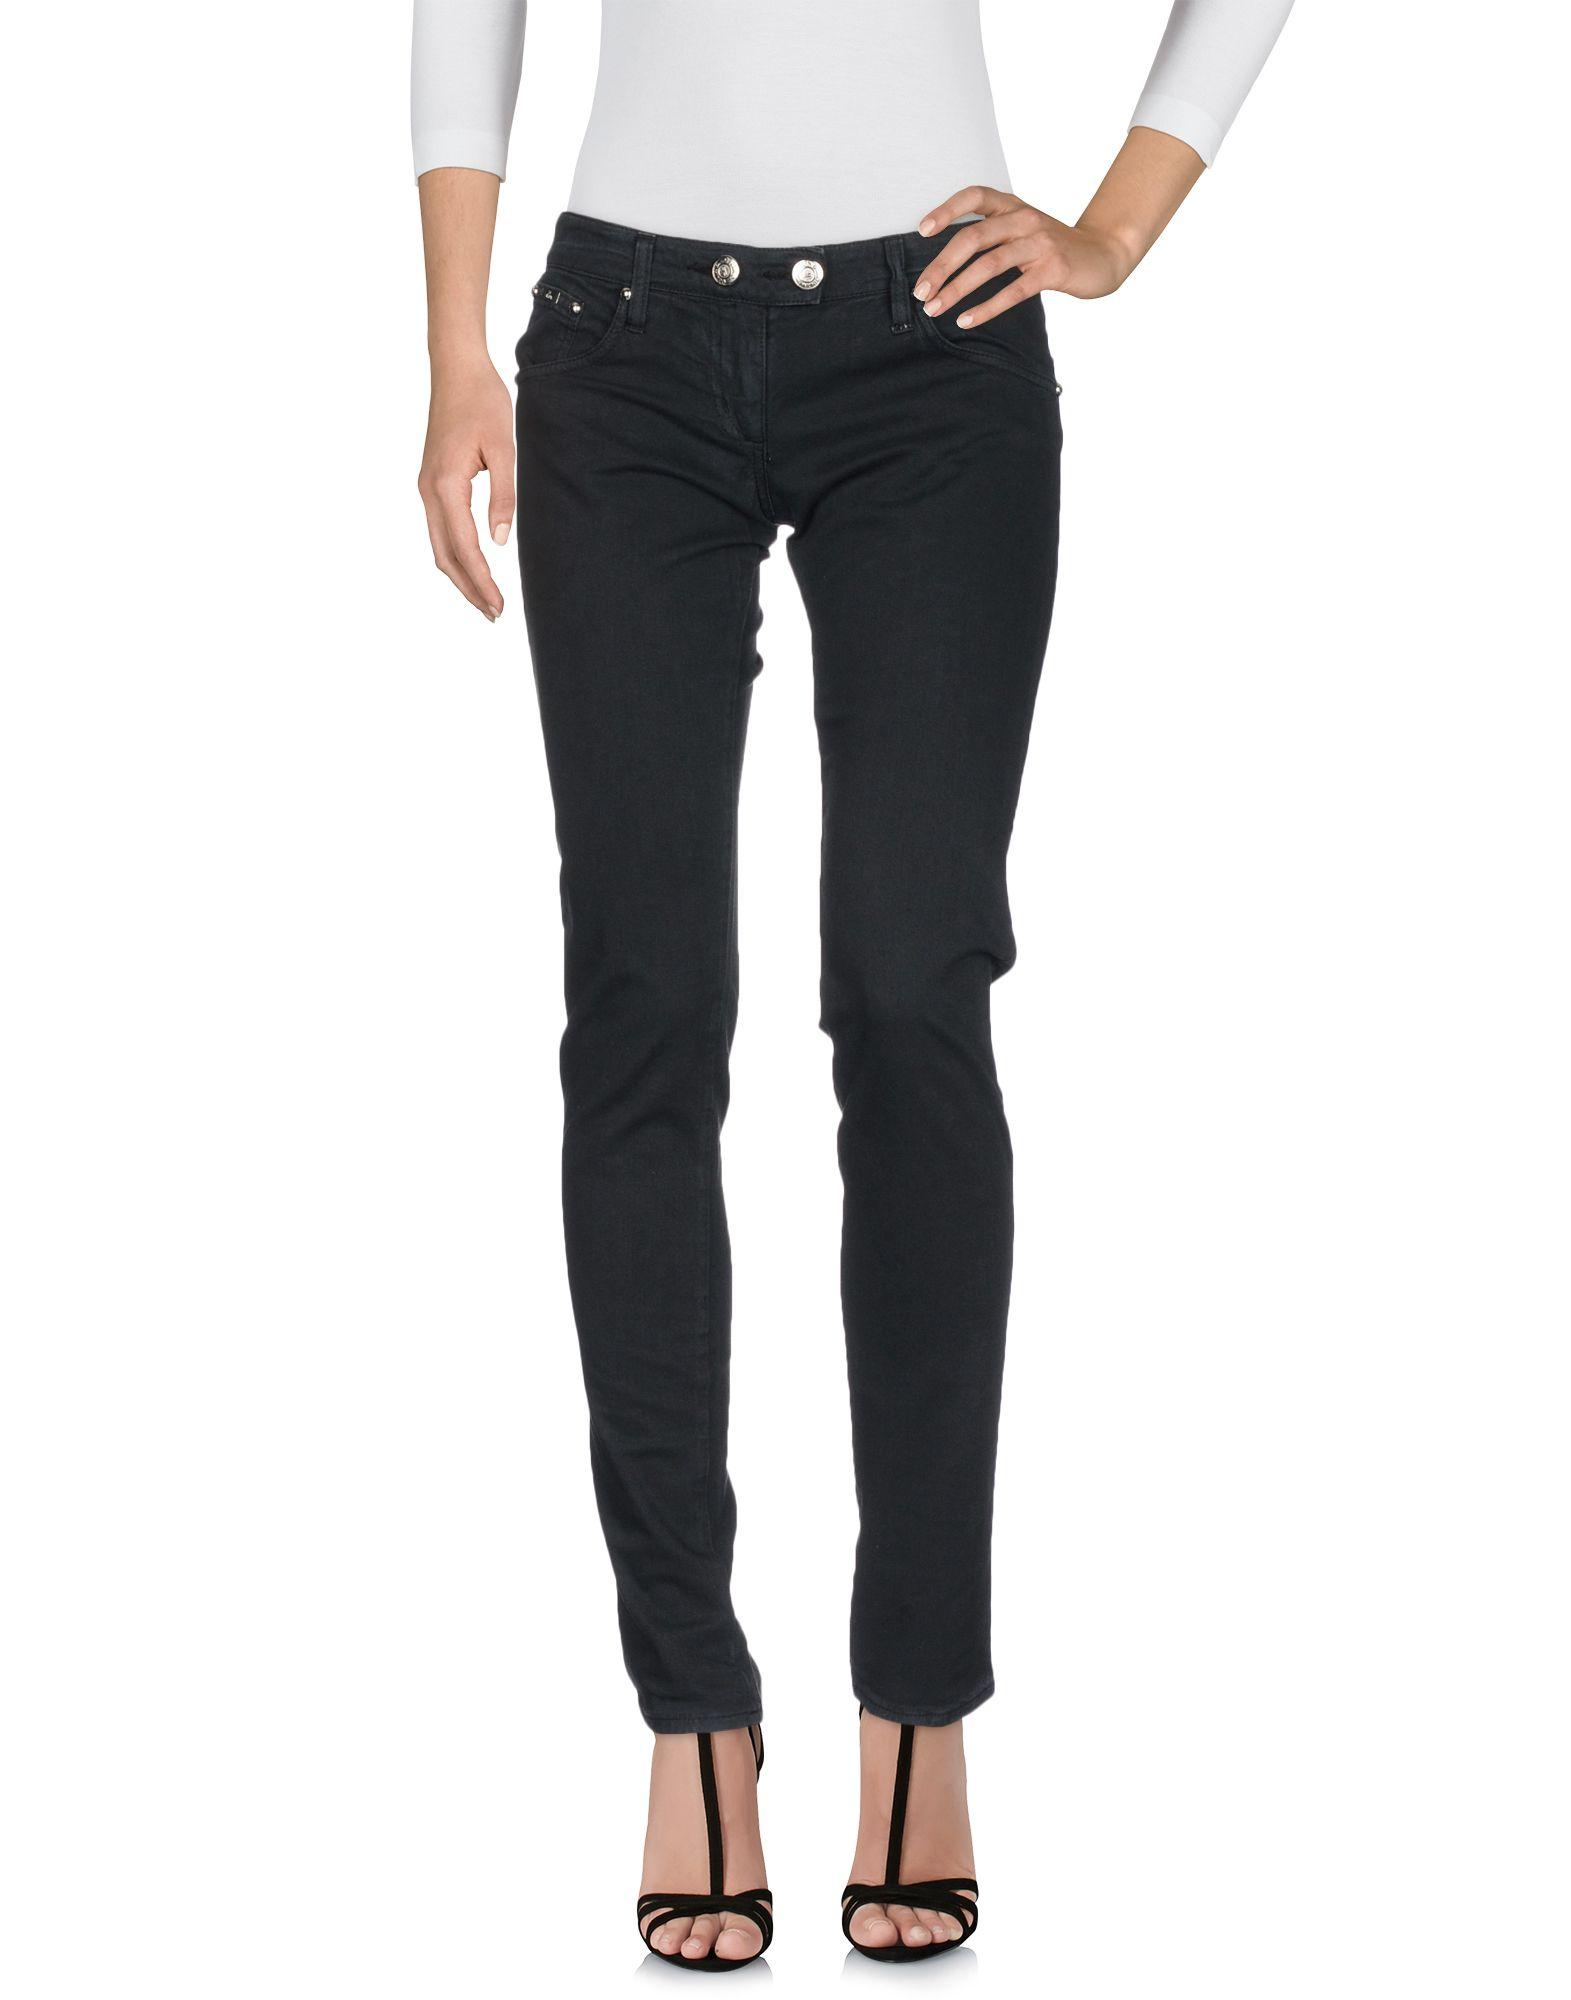 Pantaloni Jeans Elisabetta Franchi For Celyn B. Donna - Acquista online su Ud56CKh